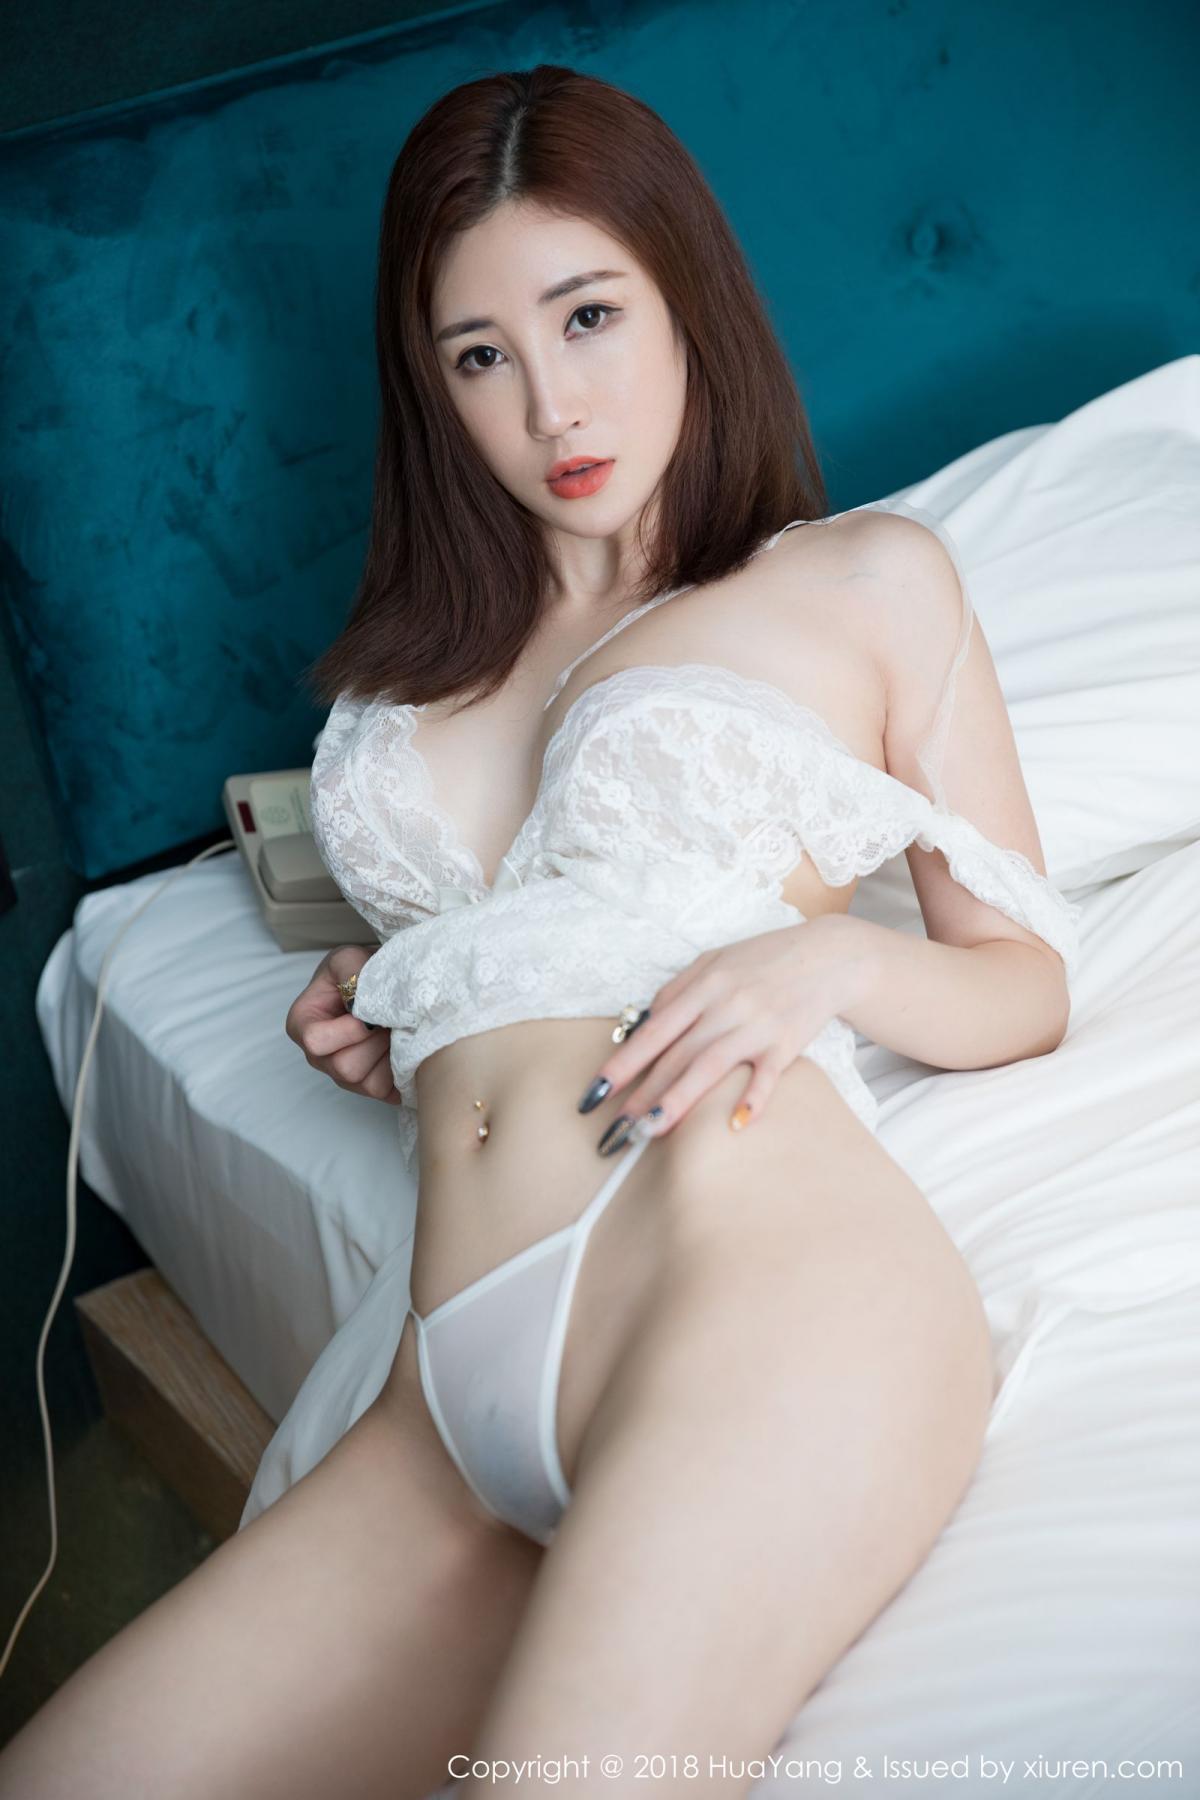 [Huayang] Vol.077 Sun Meng Yao 35P, Adult, Big Booty, HuaYang, Sun Meng Yao, Underwear